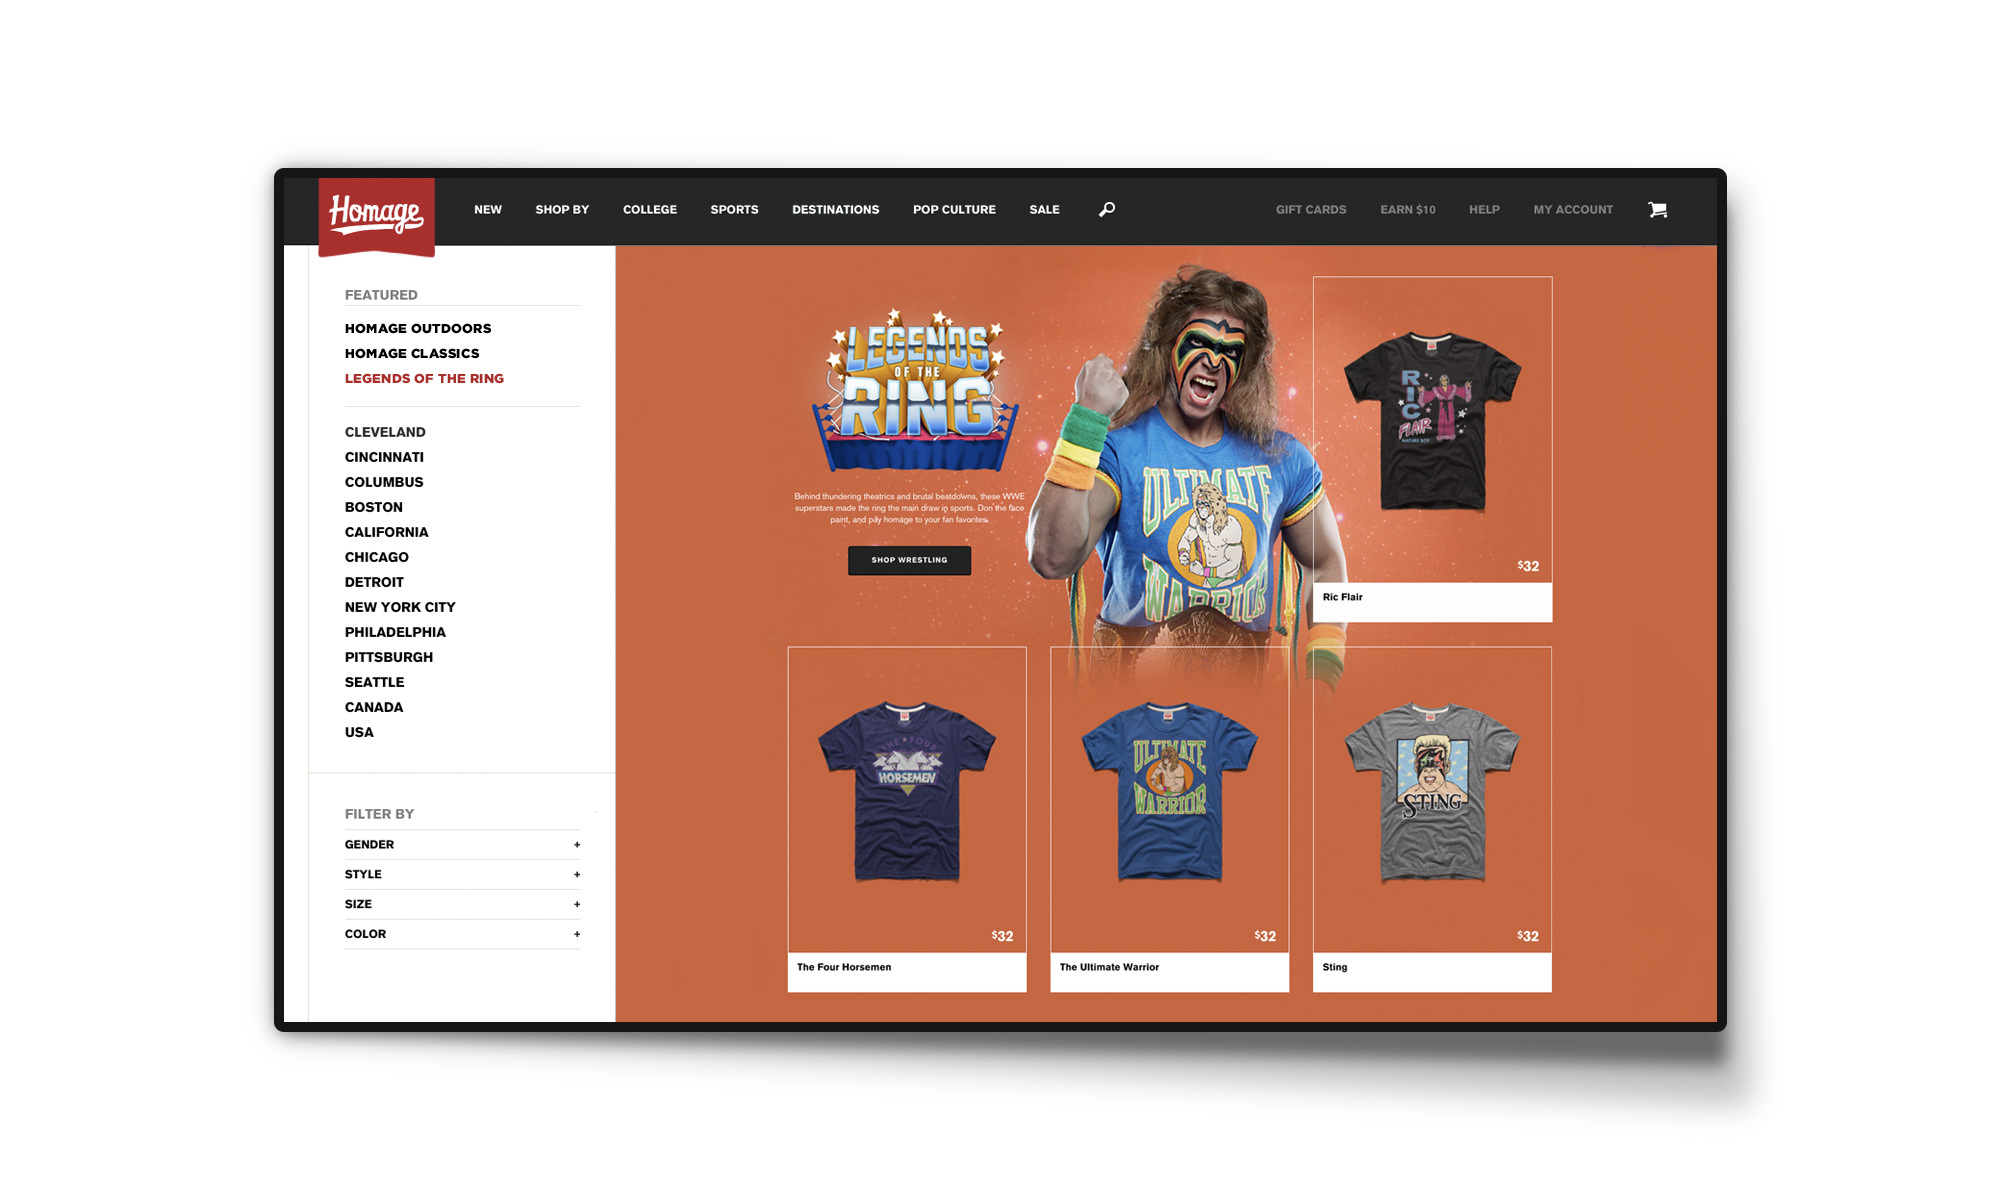 legends-of-the-ring-product-desktop.jpg